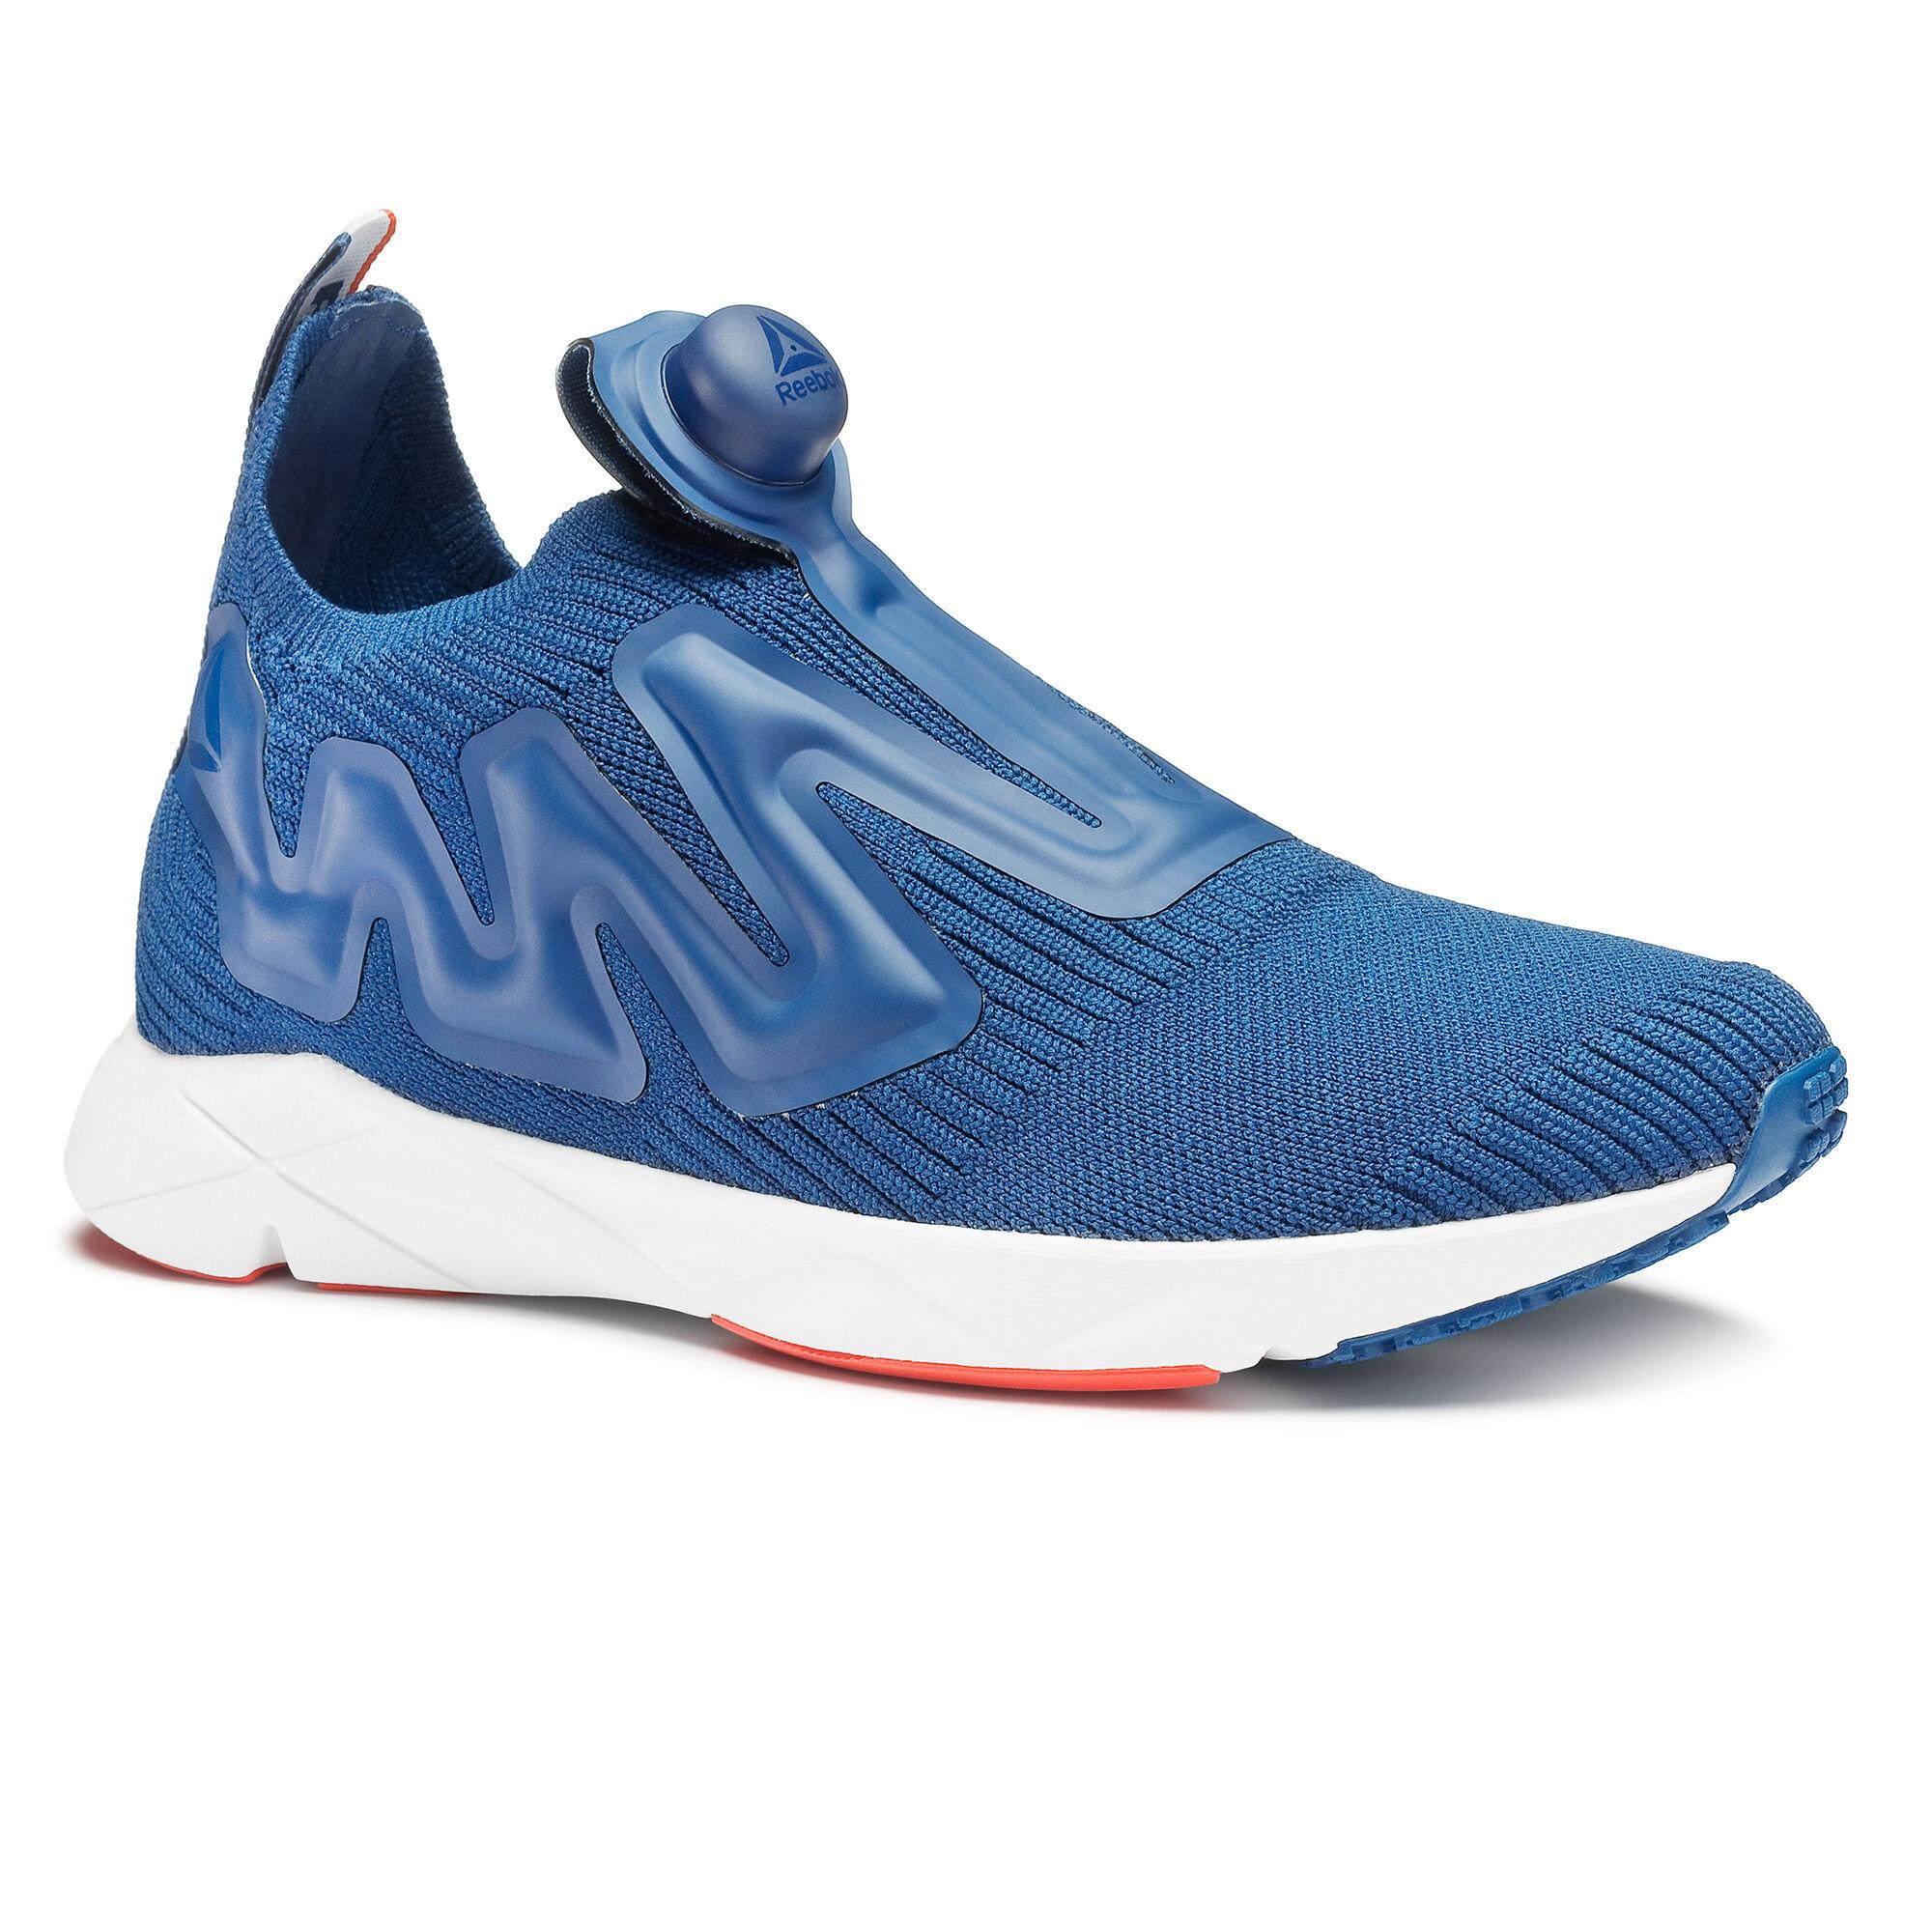 Reebok Lifestyle Shoes Pump Supreme Archive For Men White/Blue CN2709